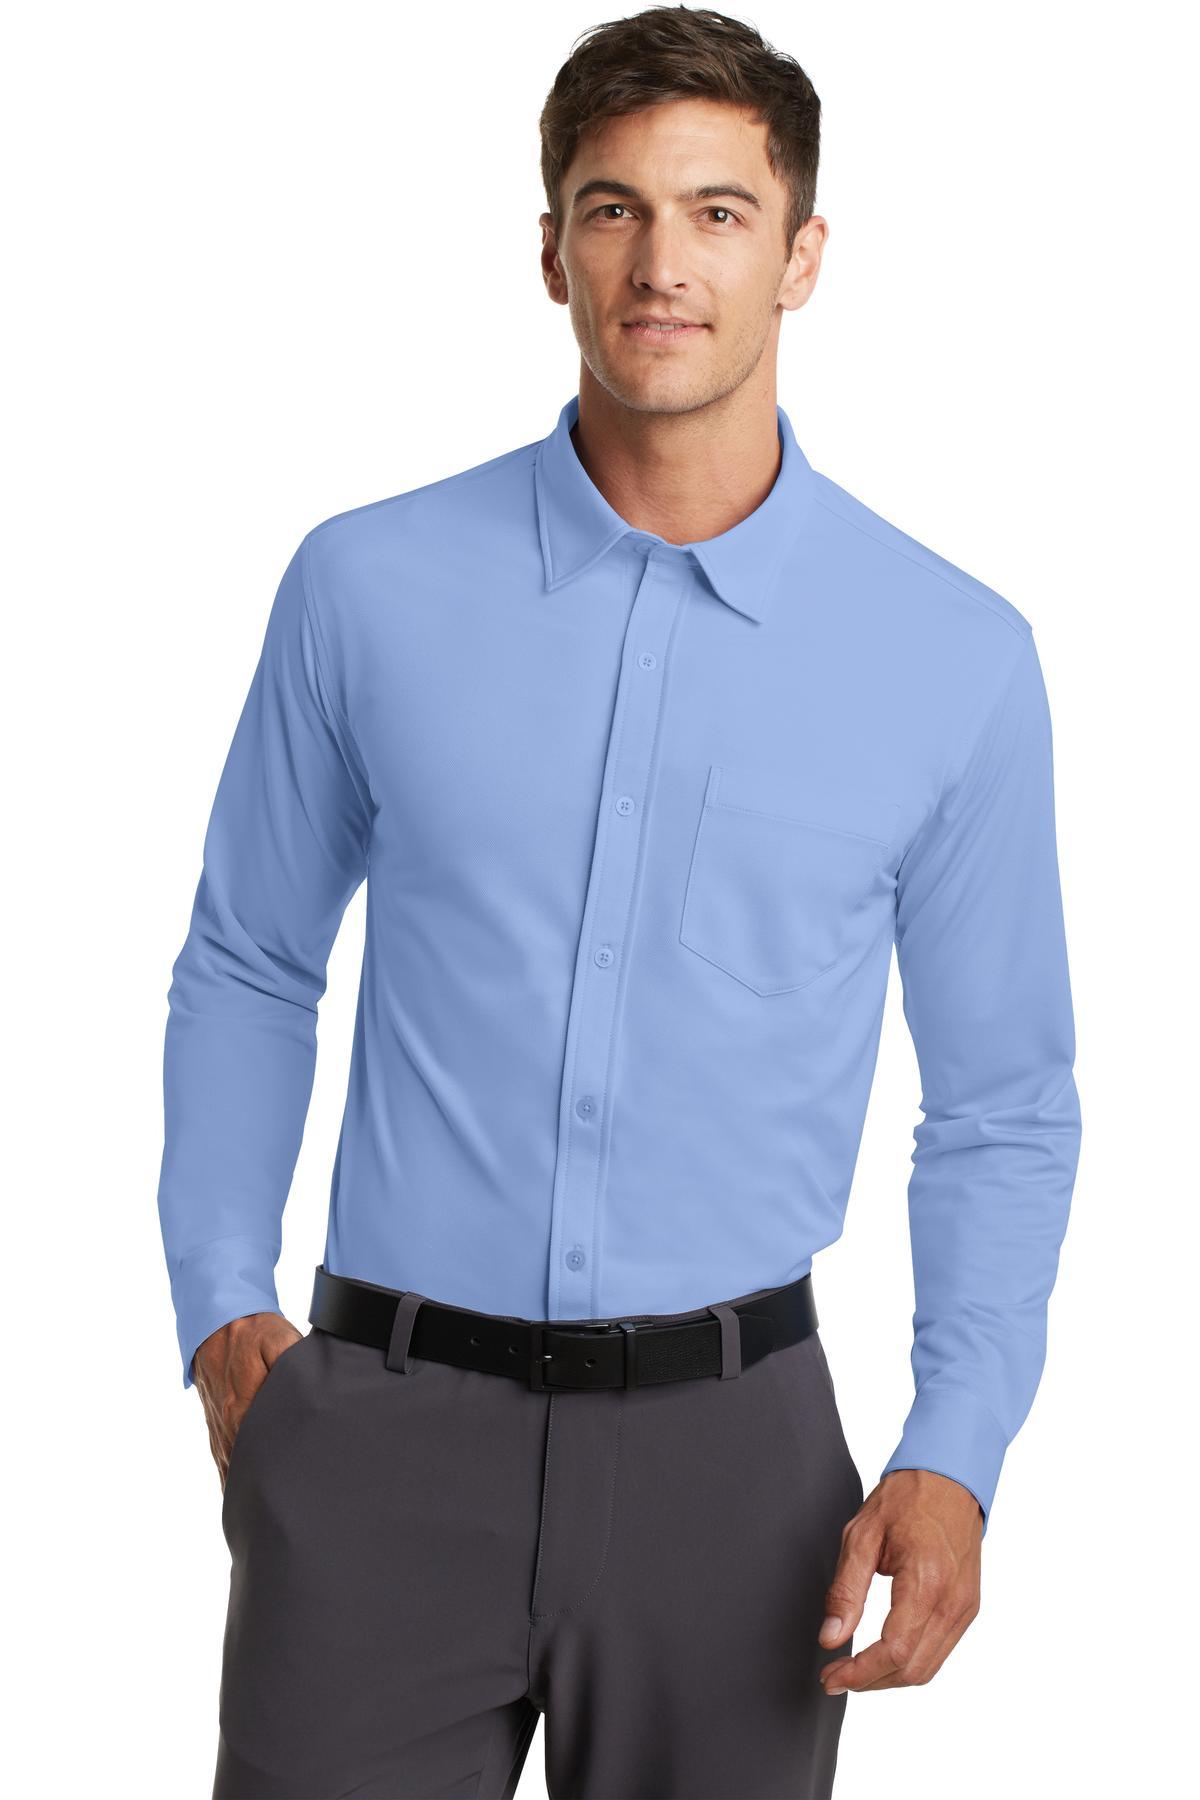 click to view Dress Shirt Blue